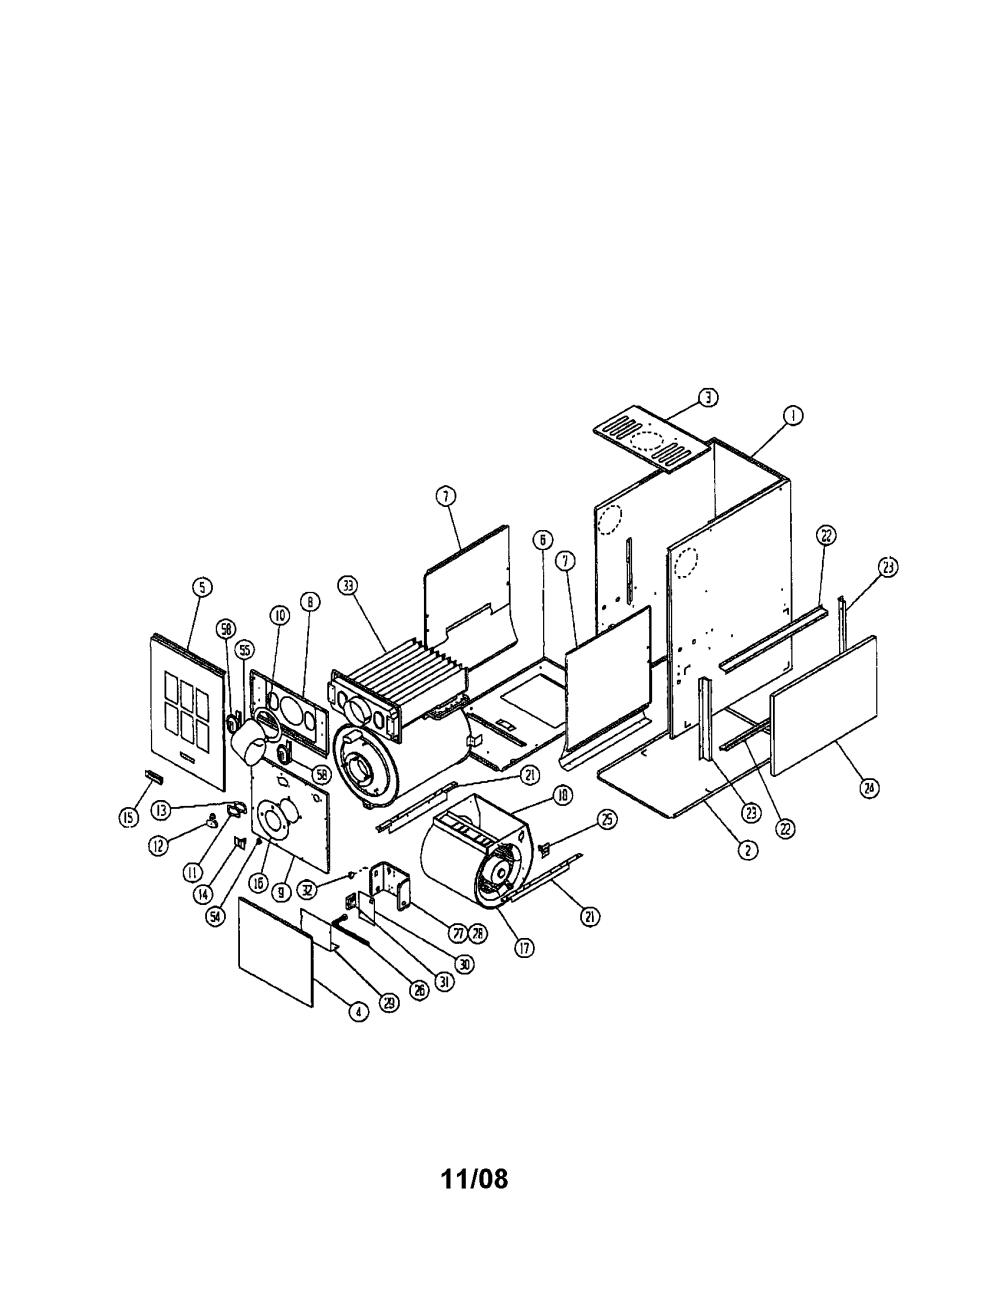 medium resolution of ducane furnace manual oil filter ducane furnace manual